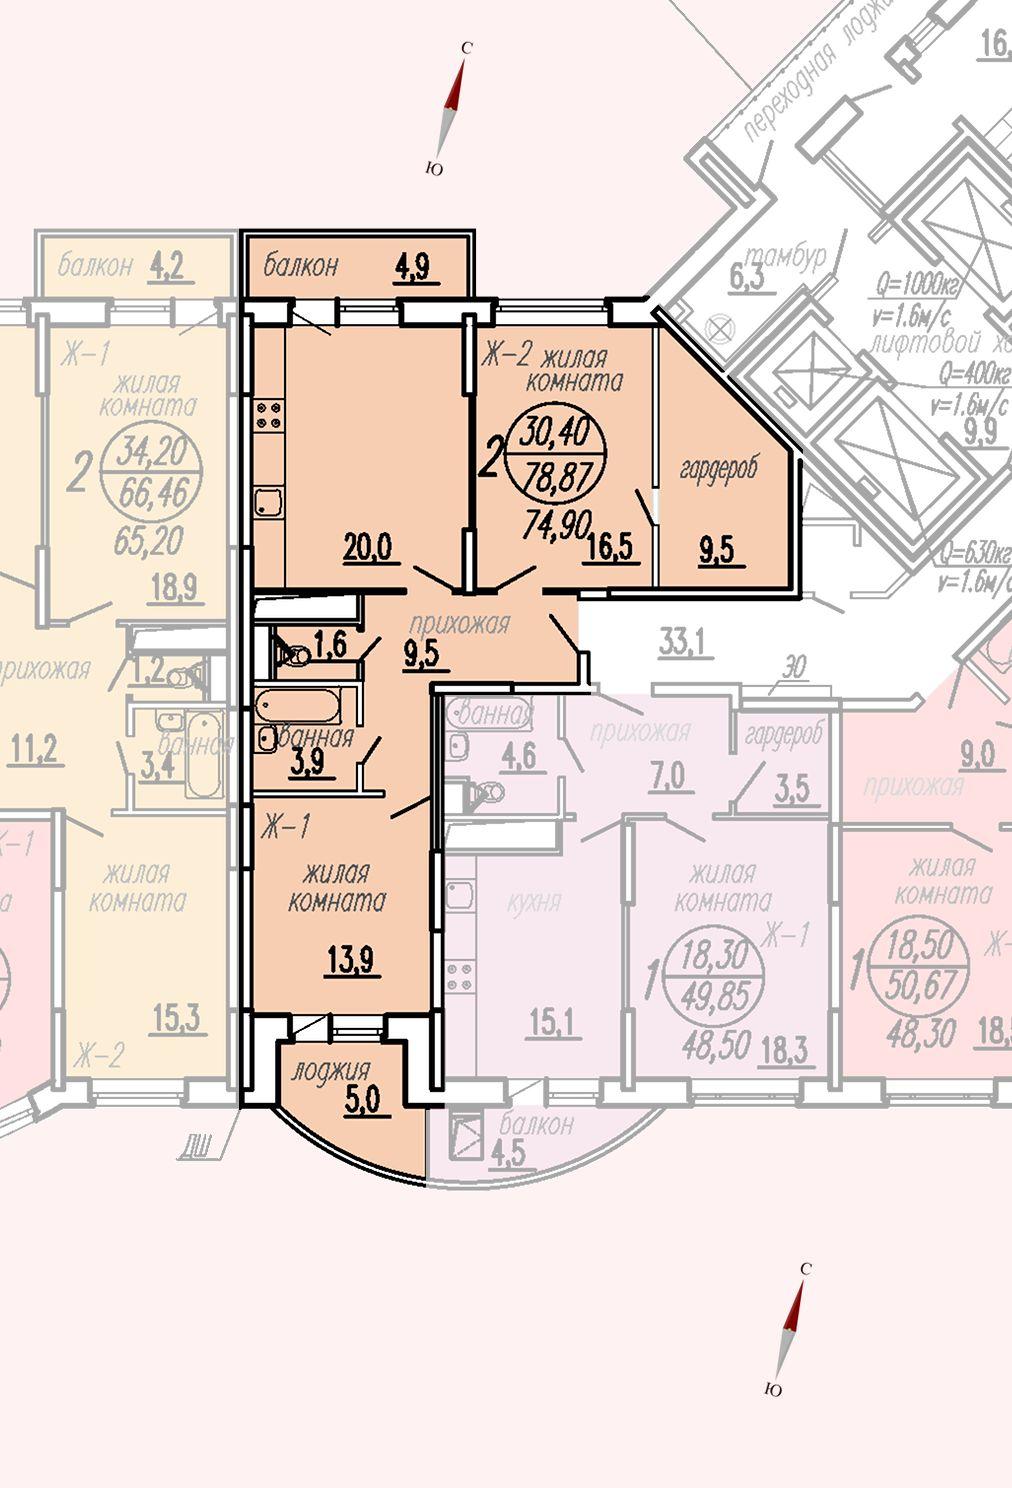 ул. Дирижабельная, д. 1, секция3, квартира 78,87 м2